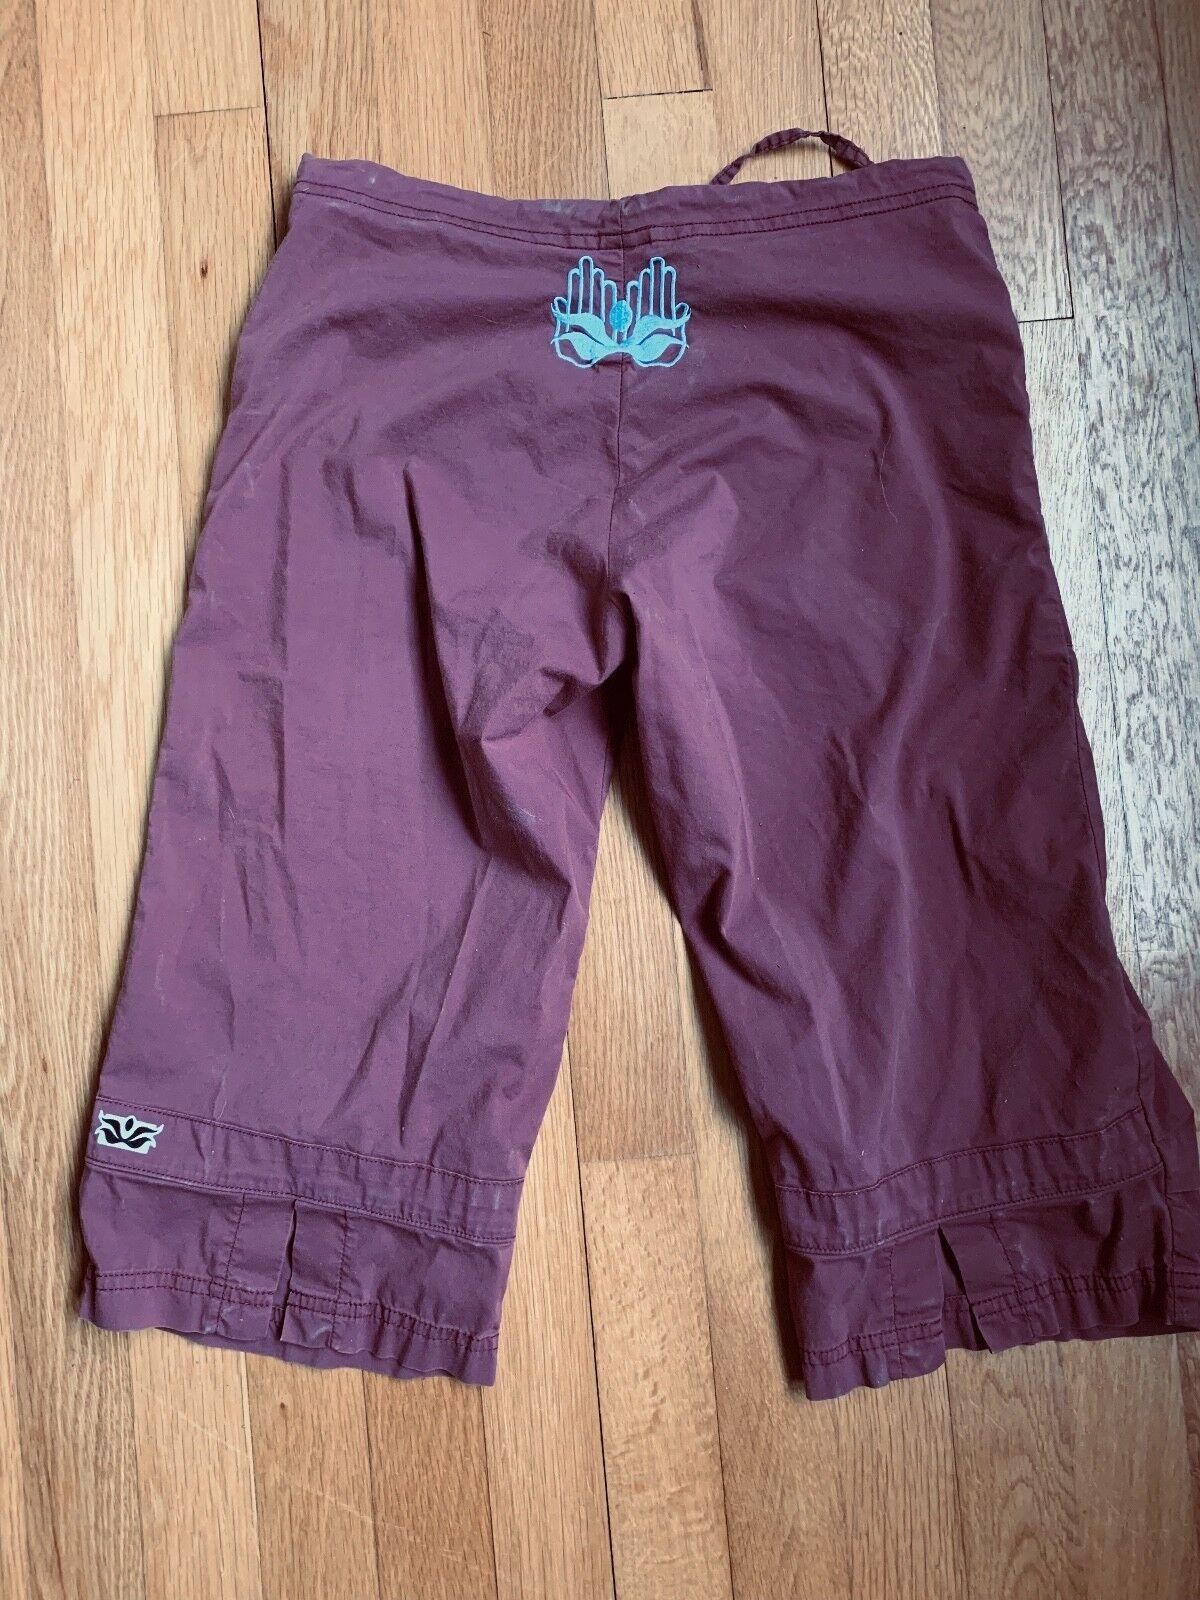 Be Present Kona Crop Yoga Pant in light Maroon w  Blau Embroidery  XXS sz 2